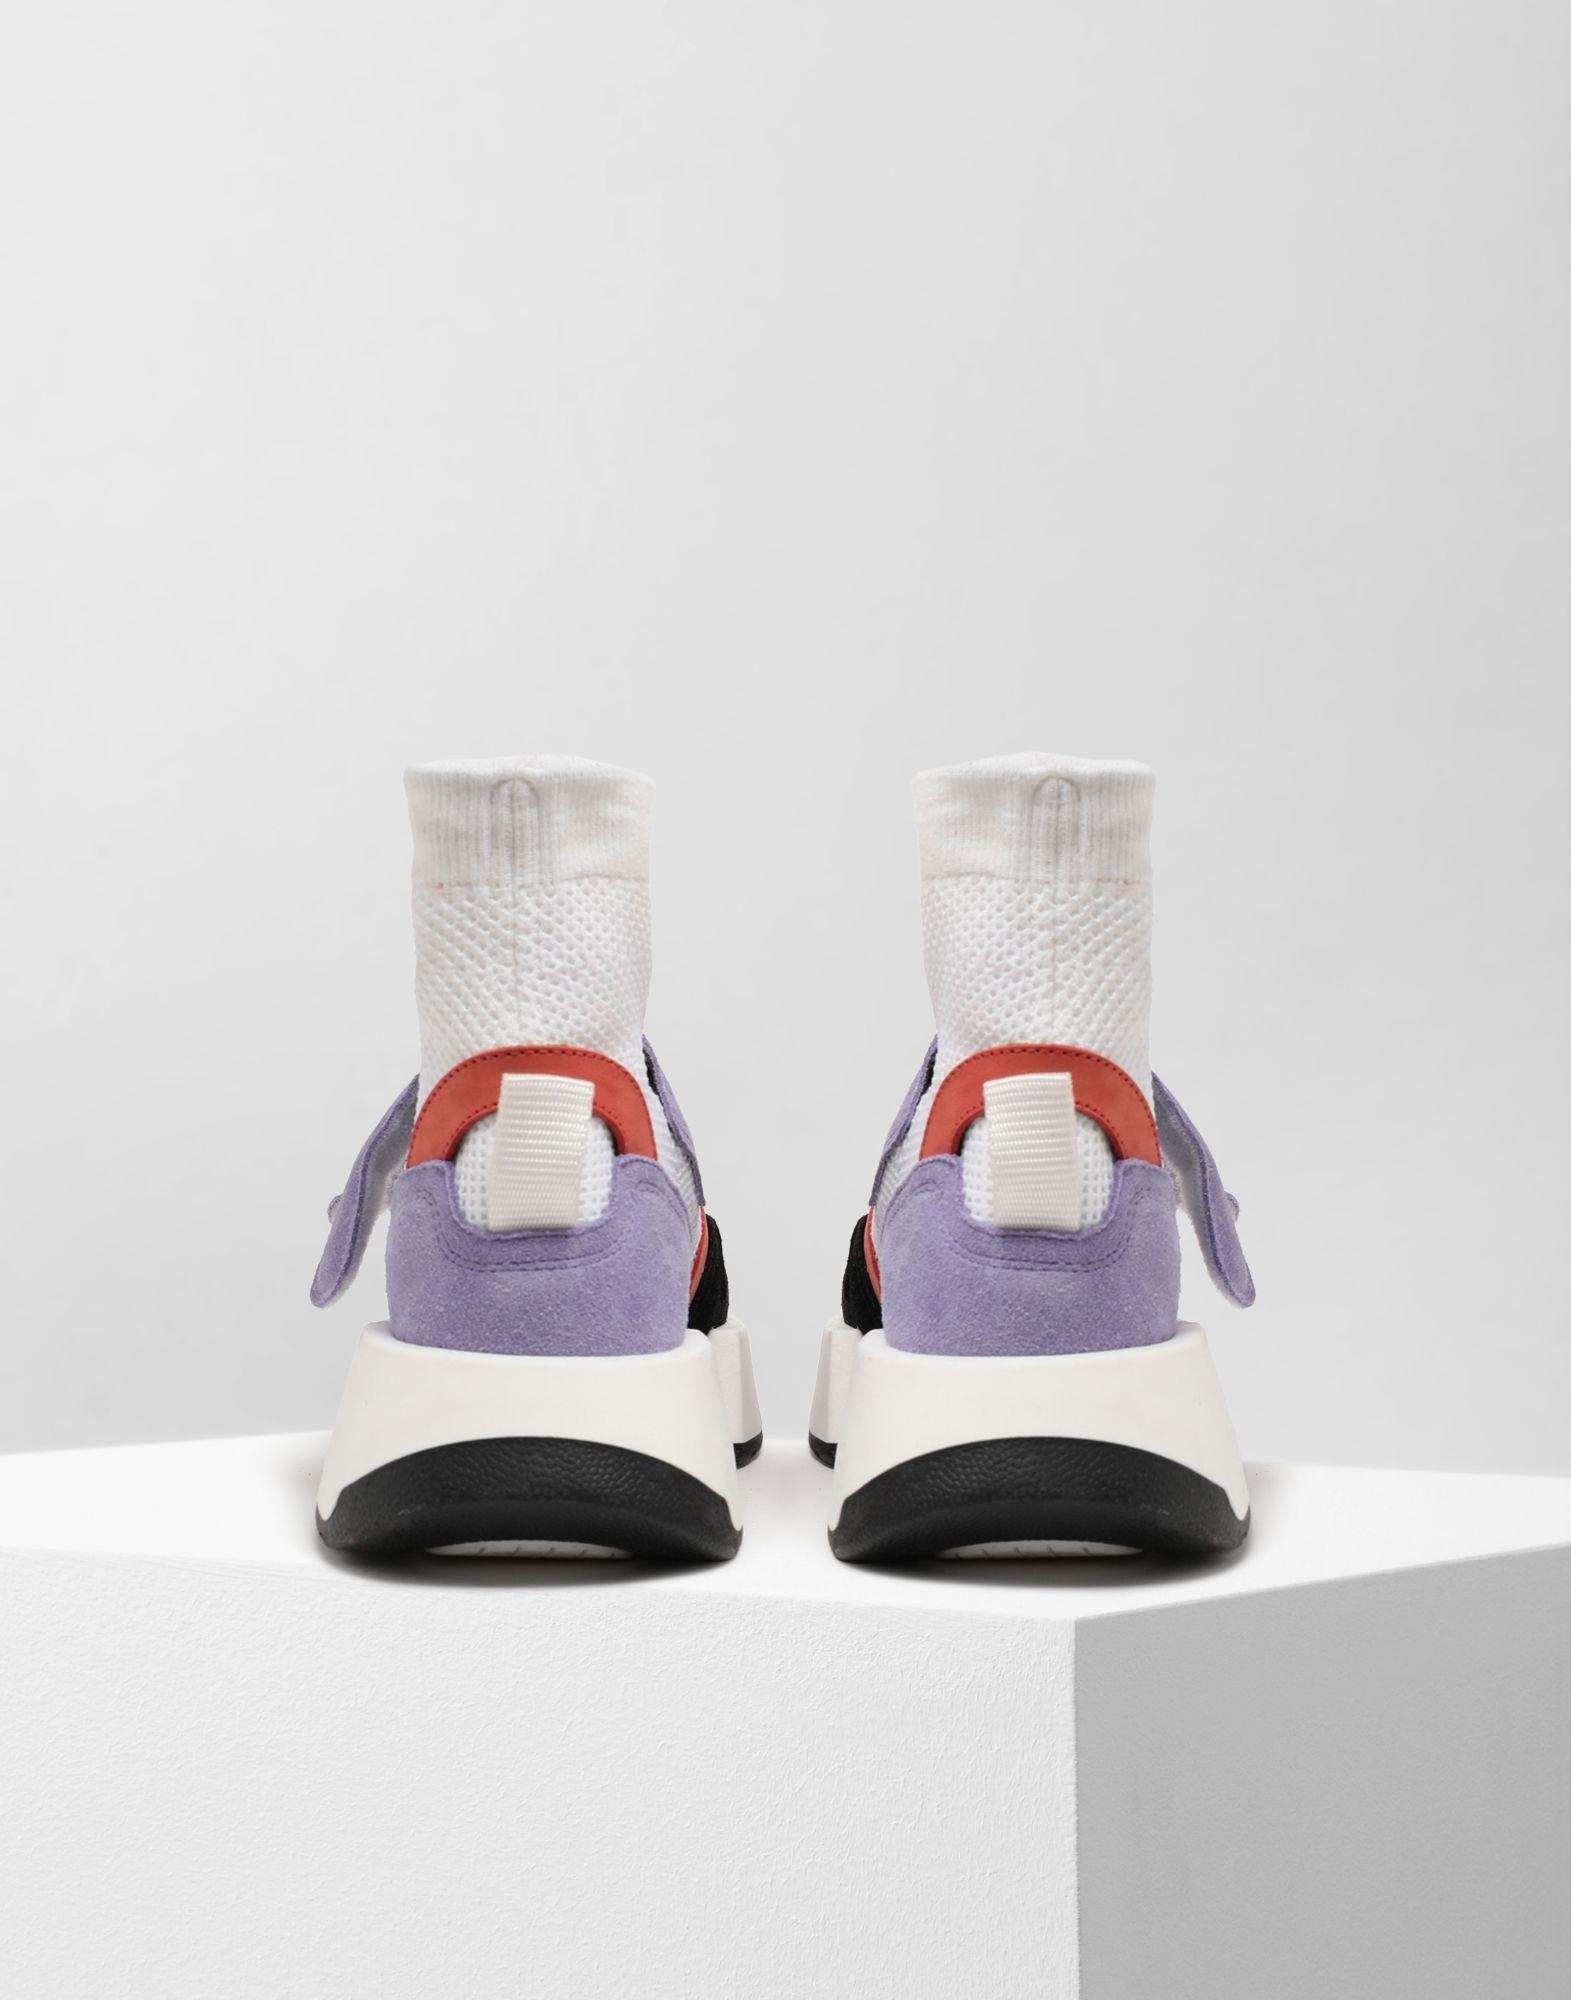 MM6 MAISON MARGIELA Sock runner leather sneakers Sneakers Woman d